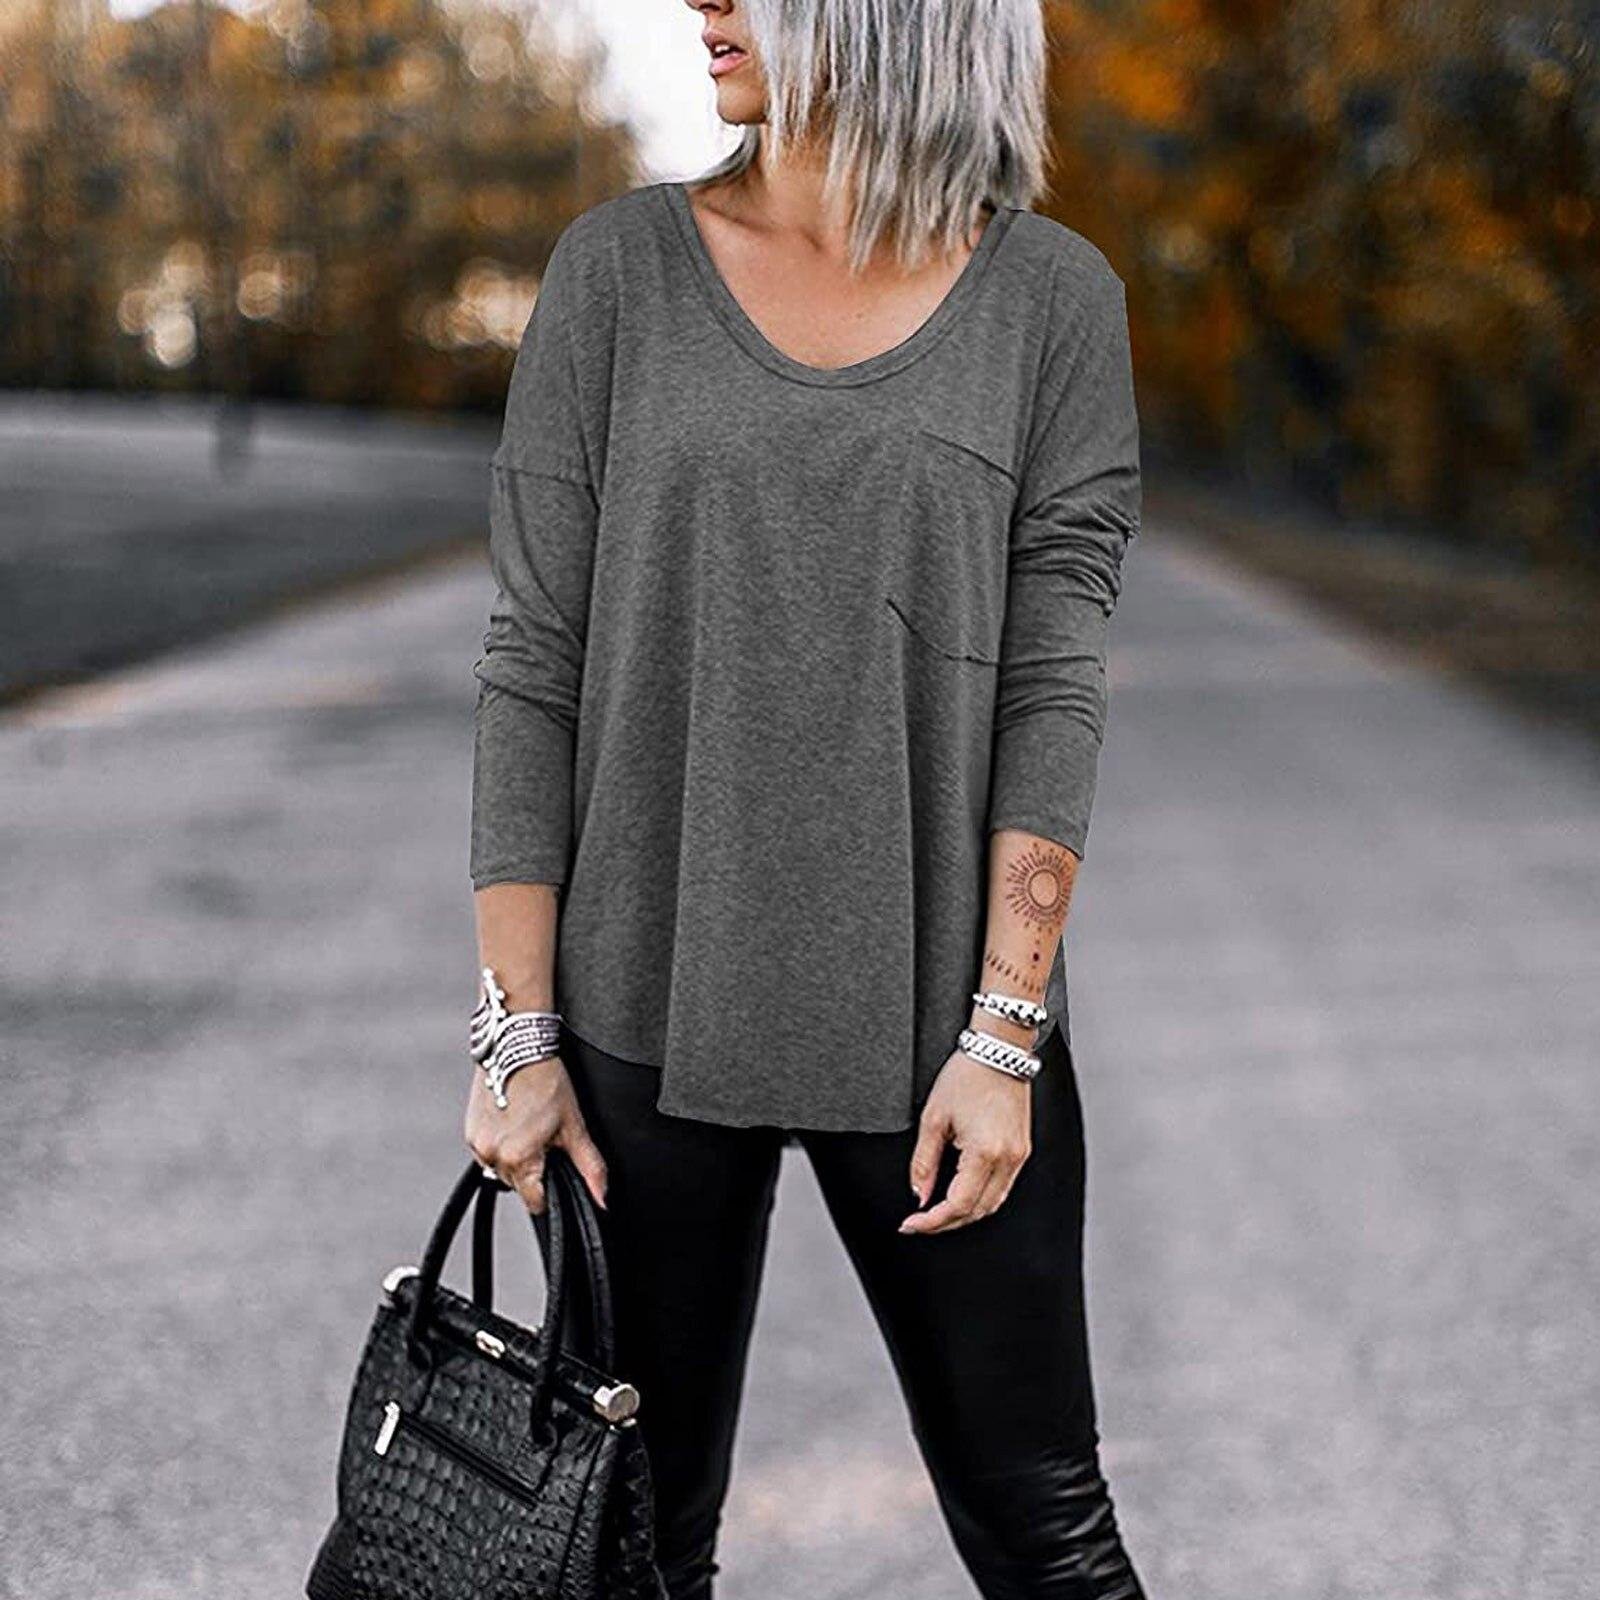 Camiseta De Manga Larga para Mujer, camisas informales De cuello redondo con...